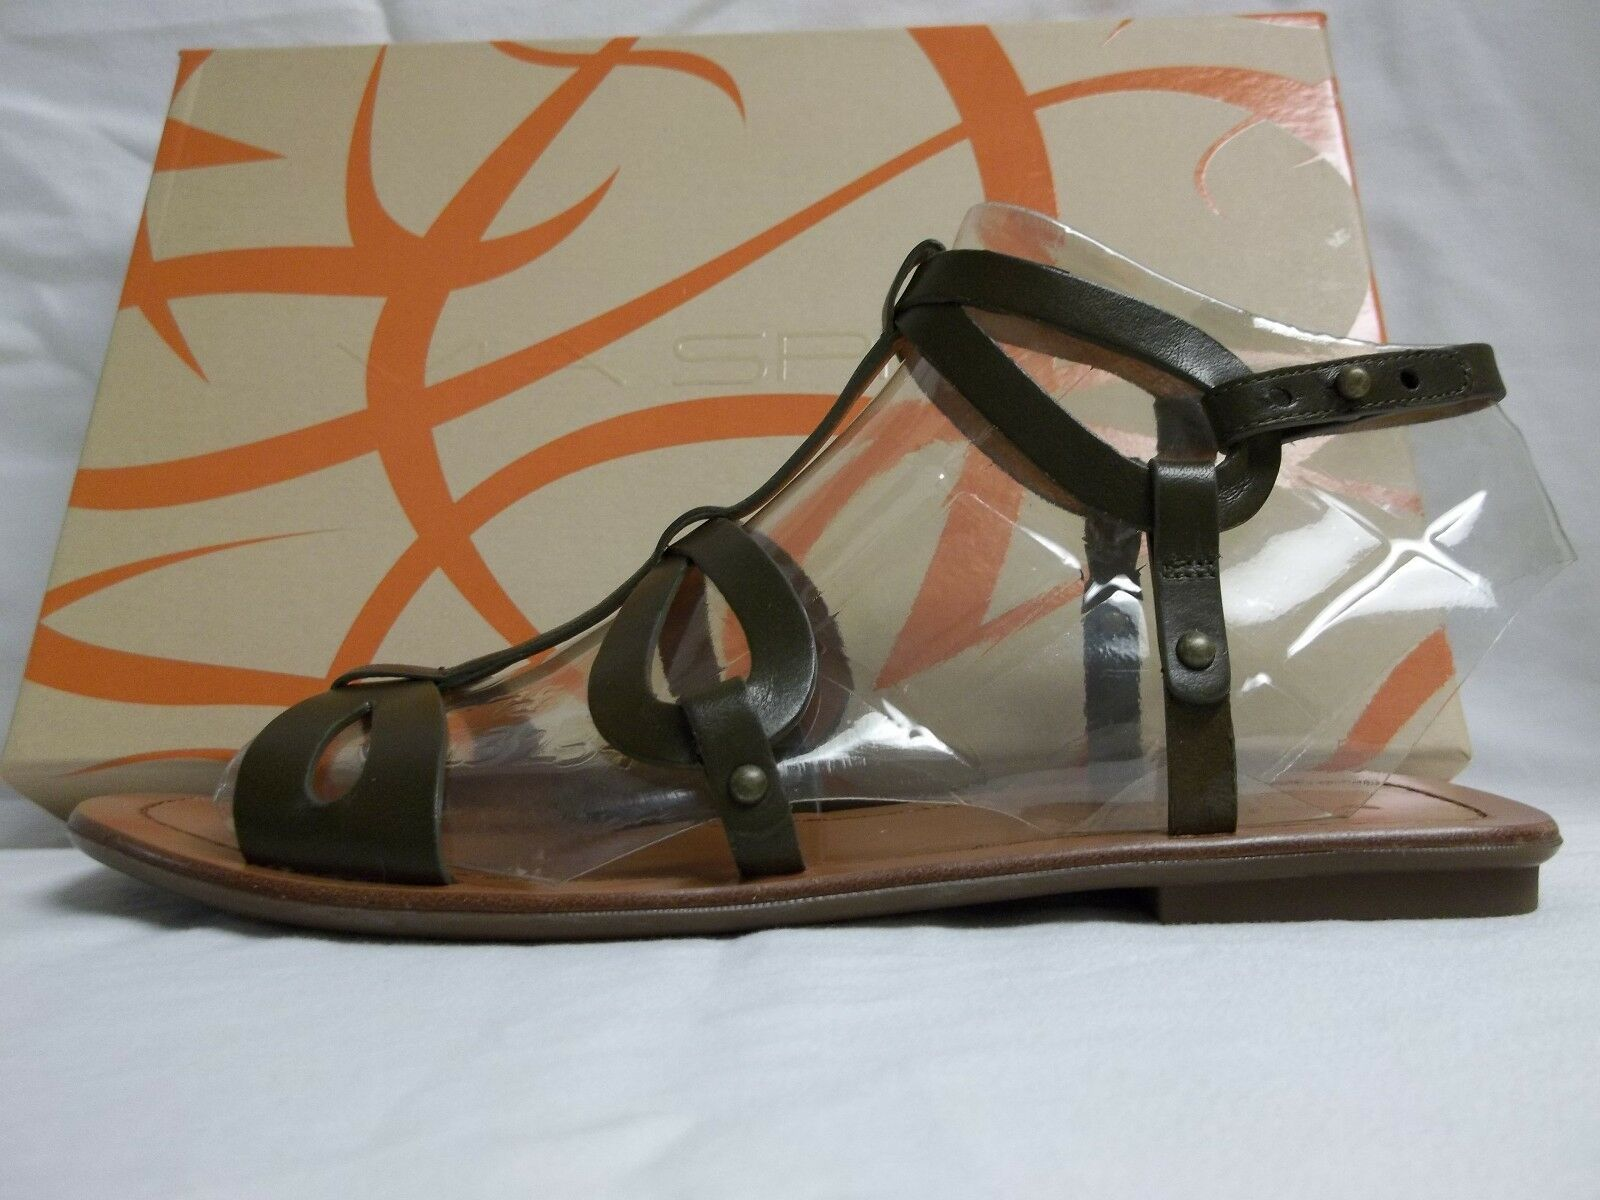 Via Spiga Sz 8.5 M Donnie Dark Sandales Olive Leder Gladiator Sandales Dark New Damenschuhe Schuhes 3a197d